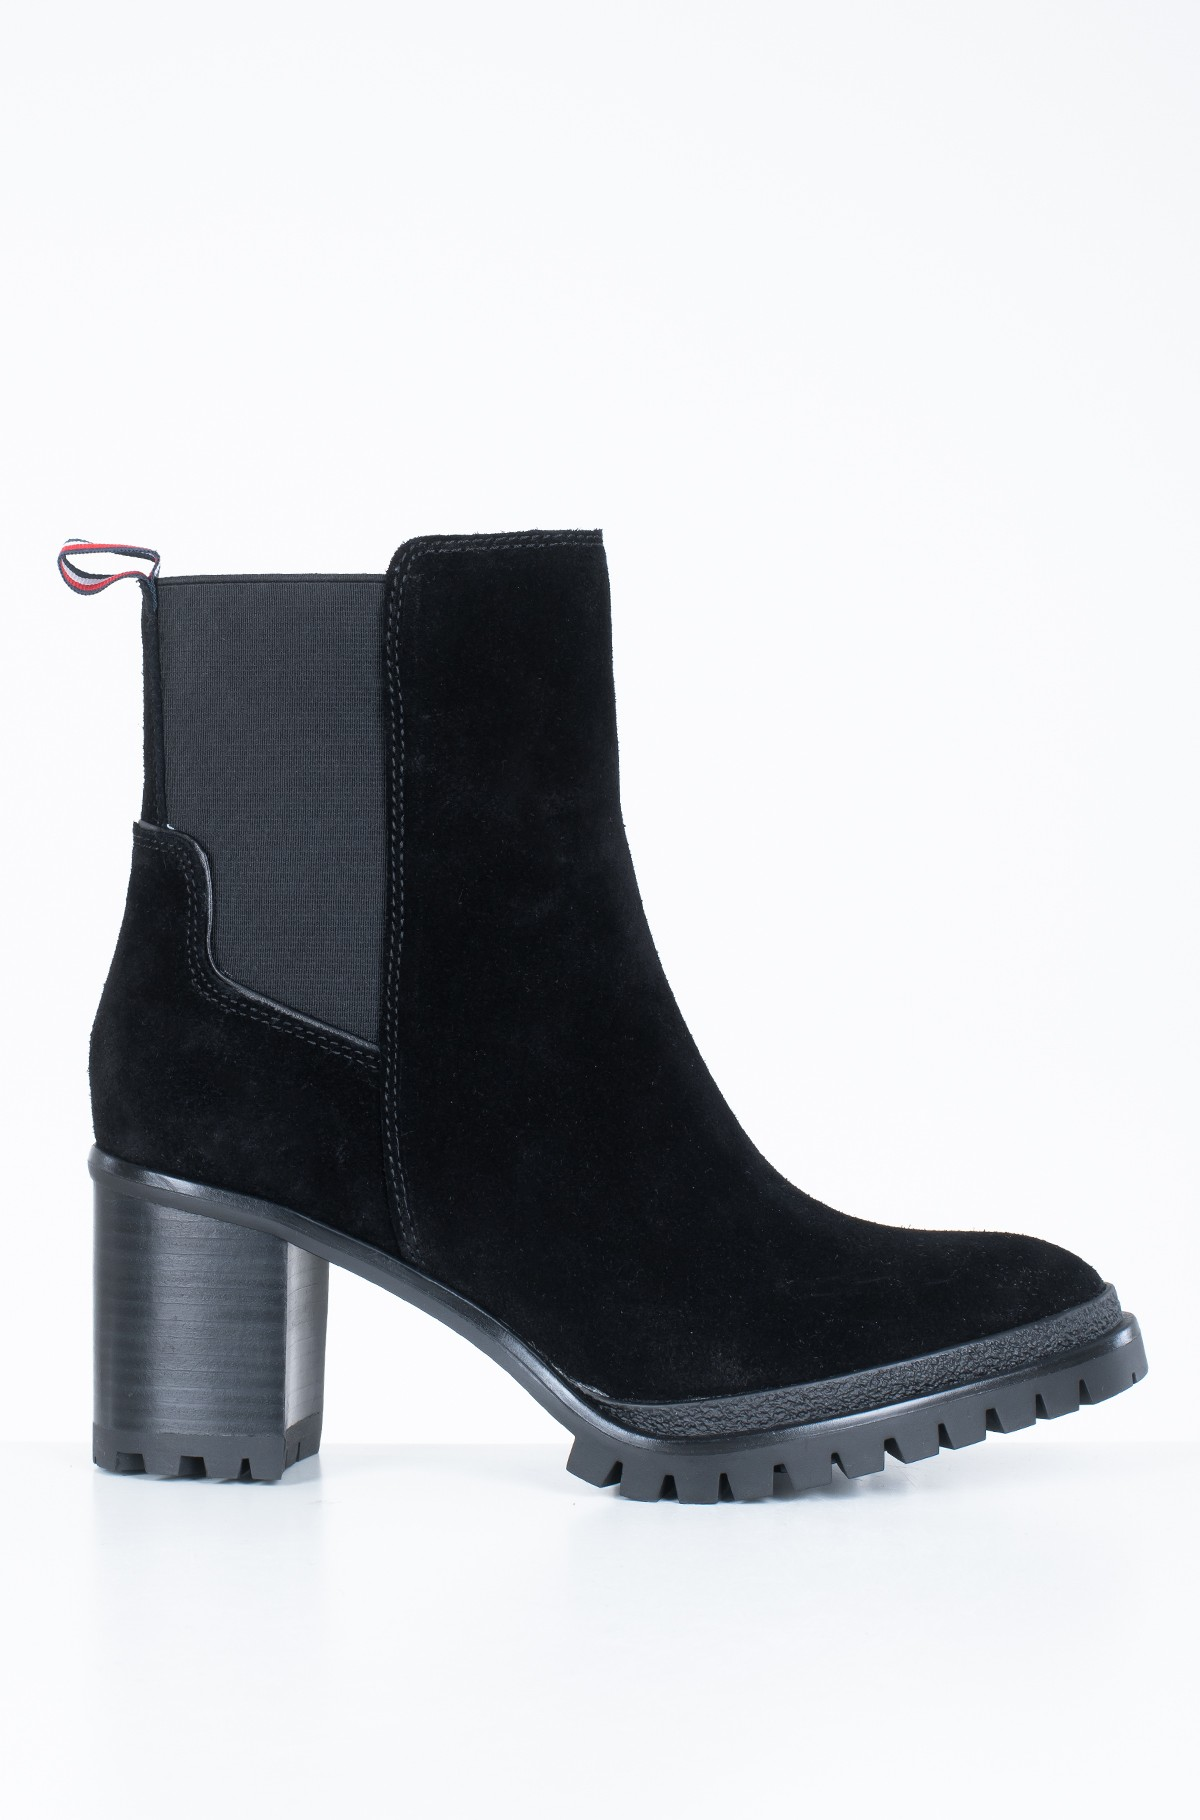 Boots SPORTY MID HEEL CHELSEA-full-1